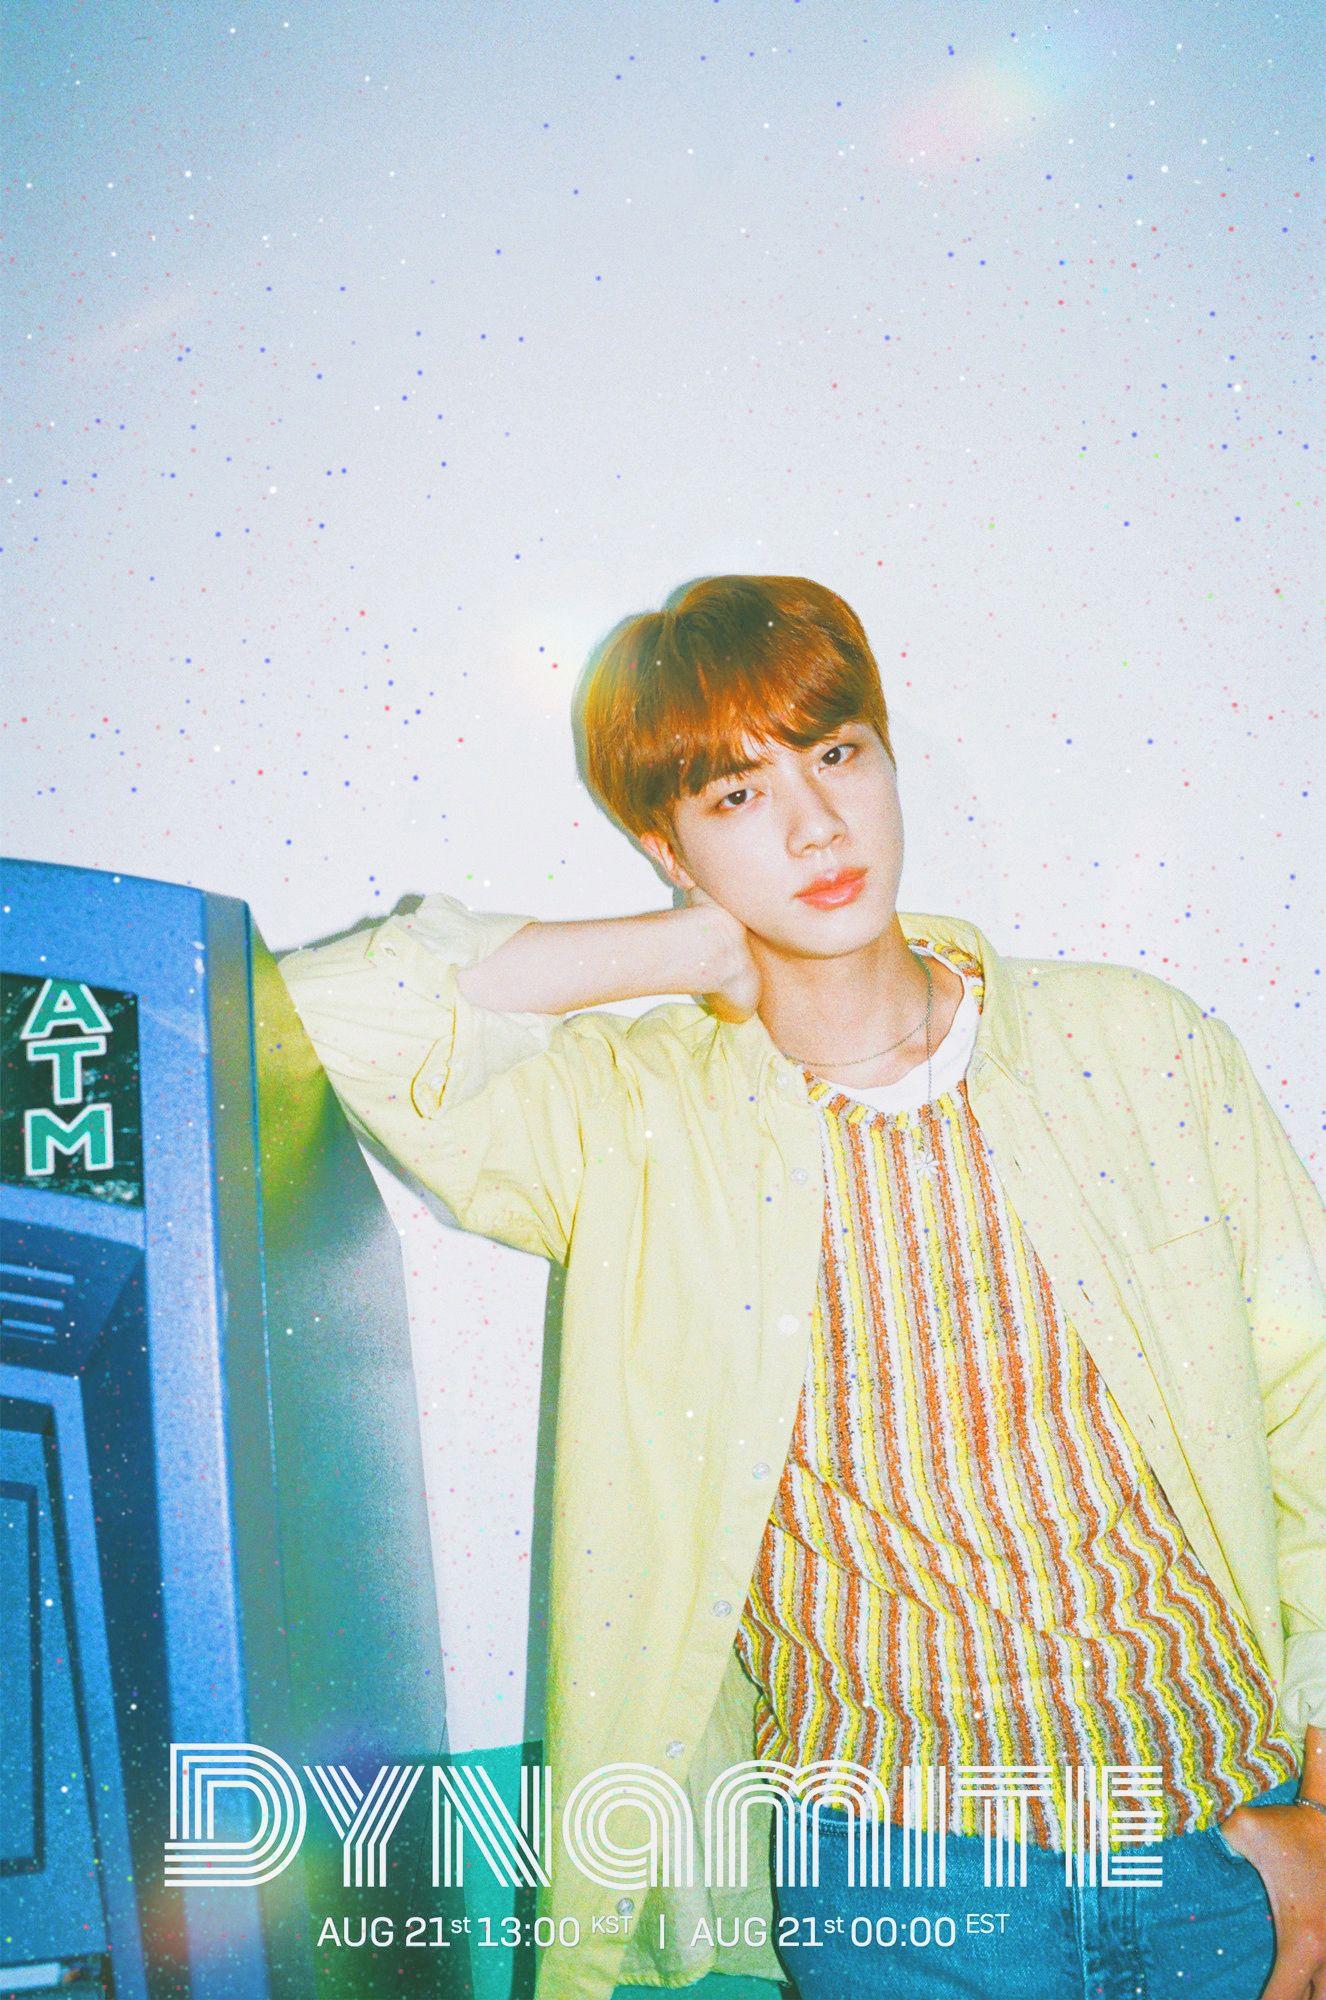 Bts Wallpaper Lockscreen Desktop Wallpapers Jin Wallpapers Bts Jin Bts Hyyh Kim Seokjin